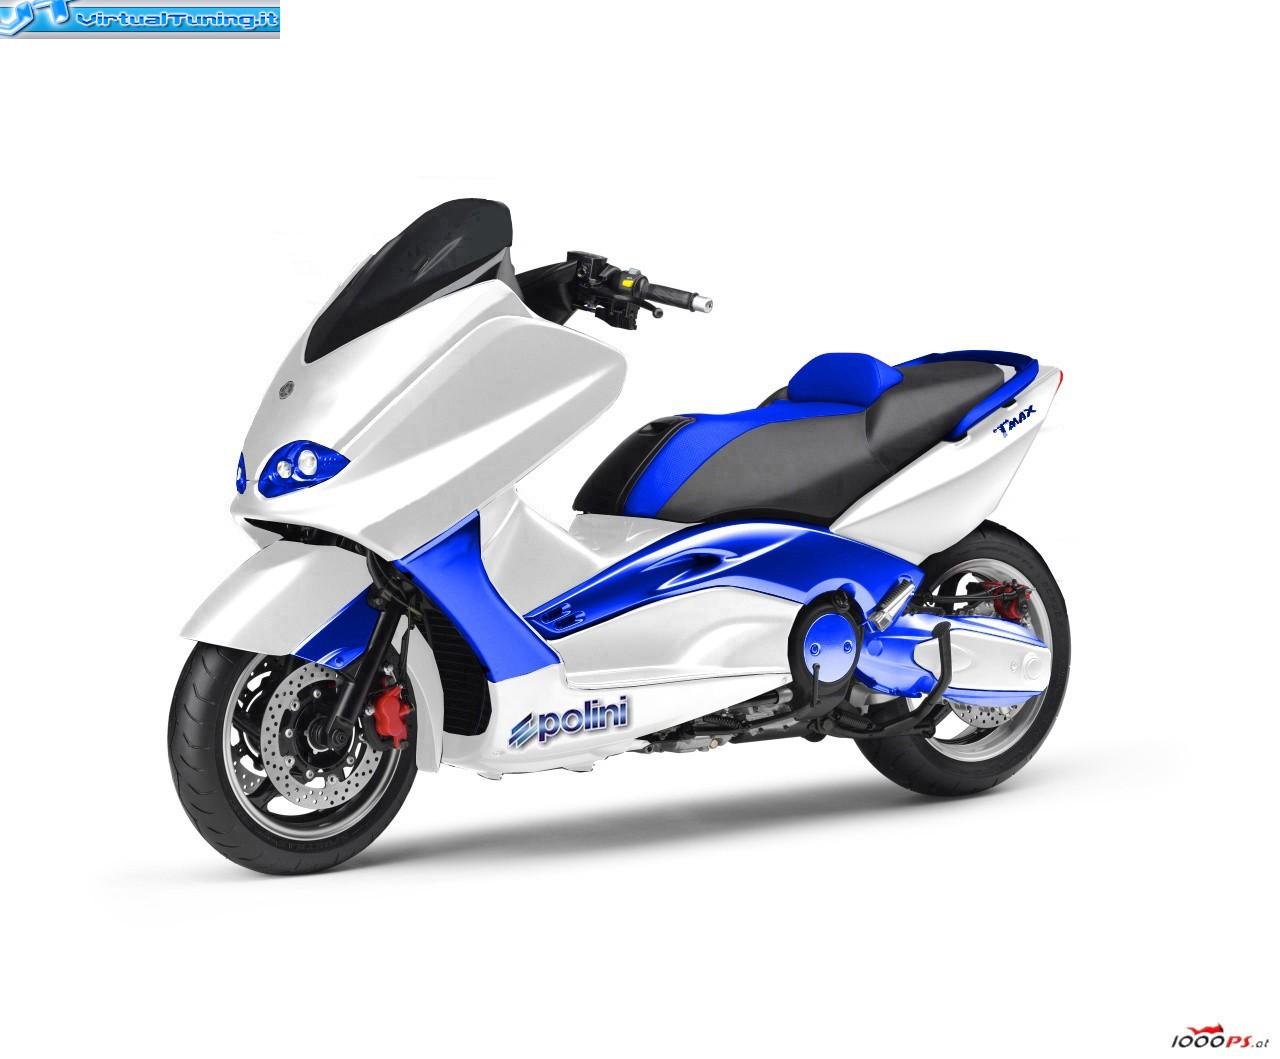 Yamaha T Max By Berta Virtualtuning It